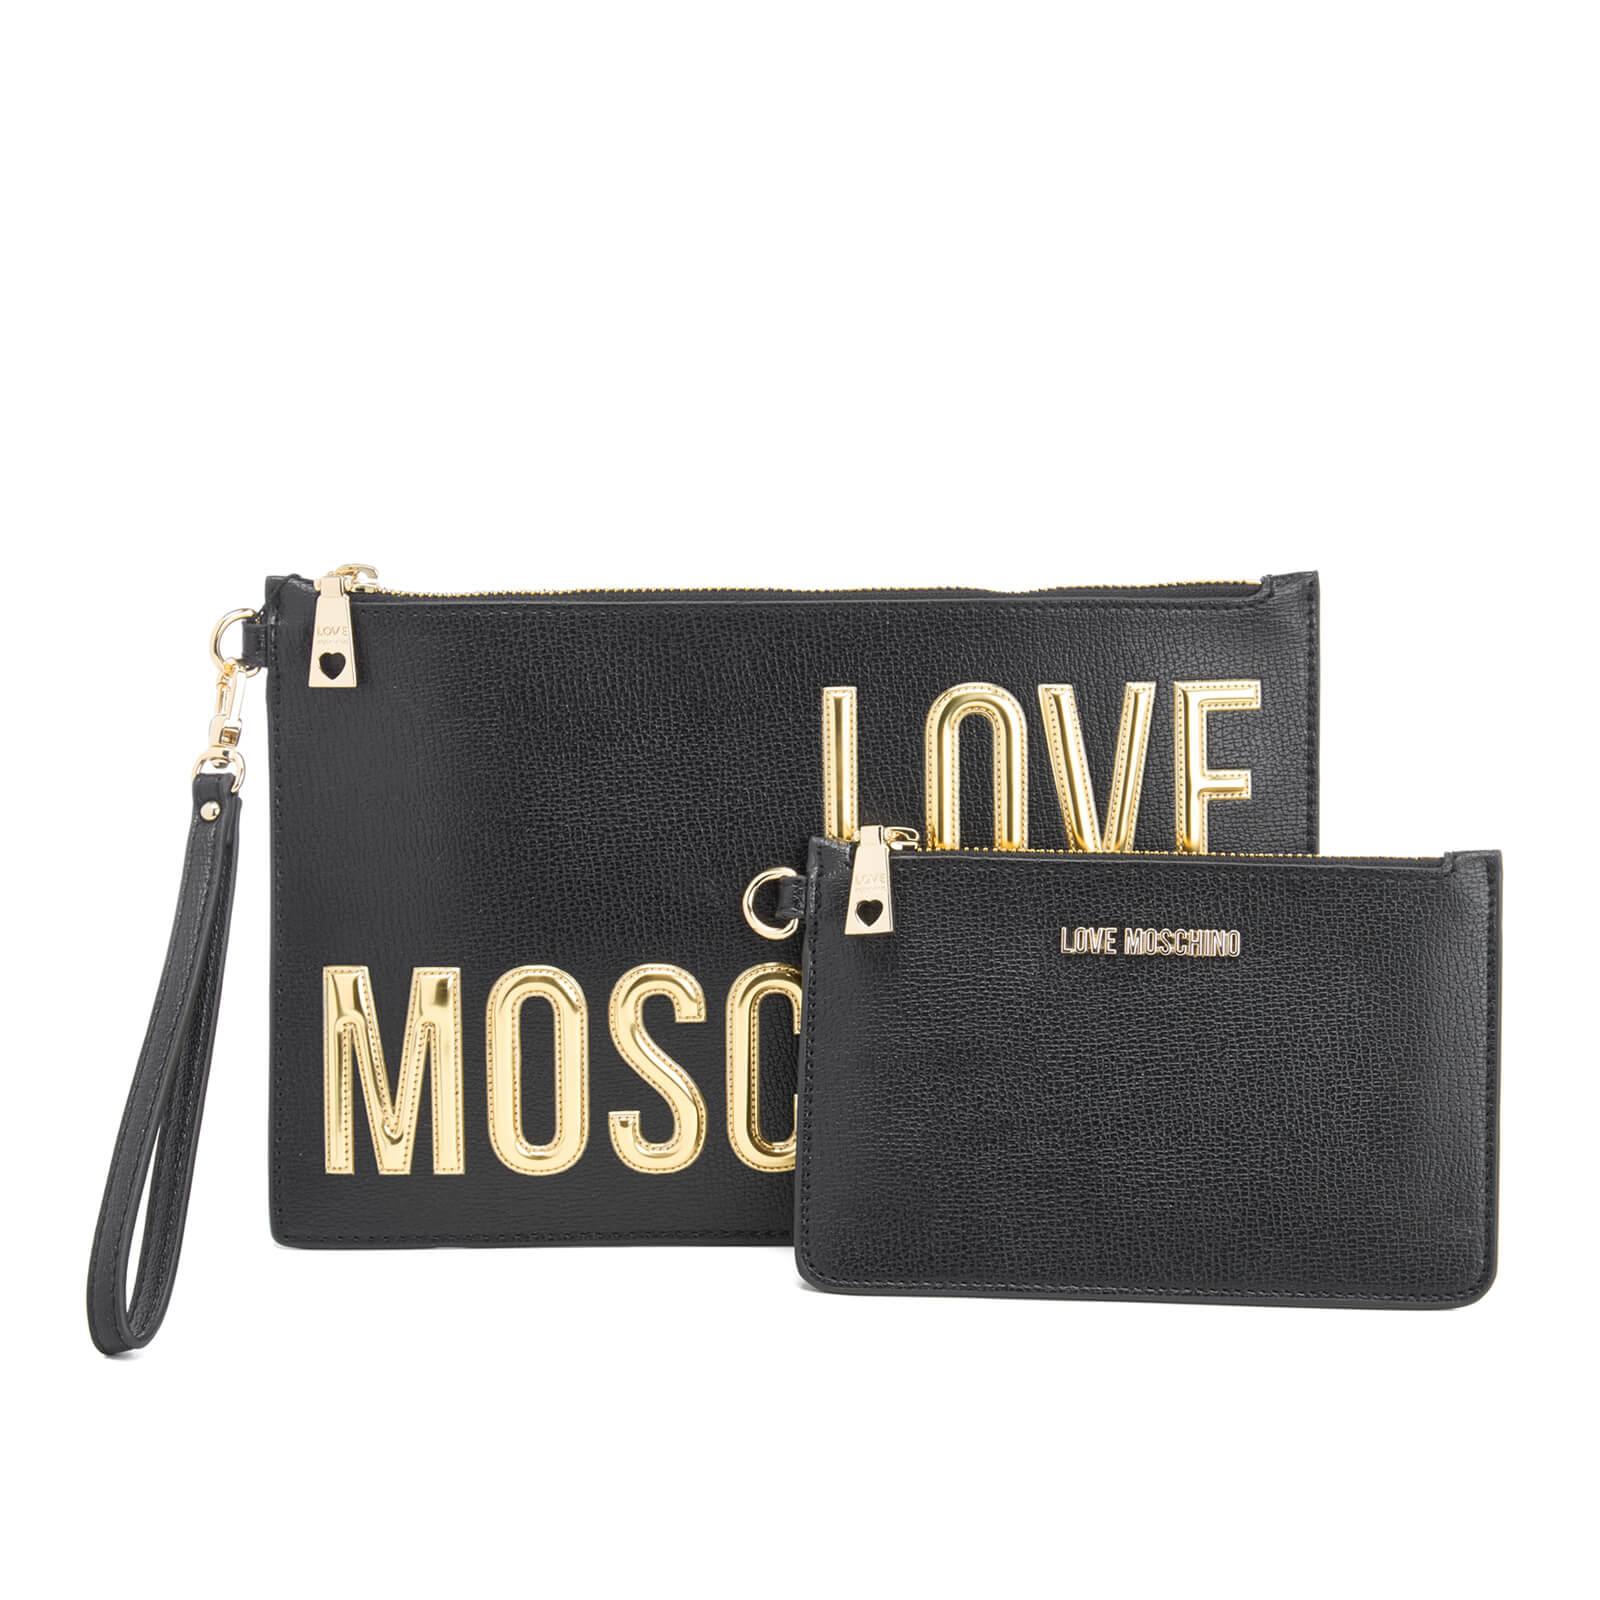 Love Moschino Women s Logo Clutch Bag - Black - Free UK Delivery over £50 e05ef0e18be